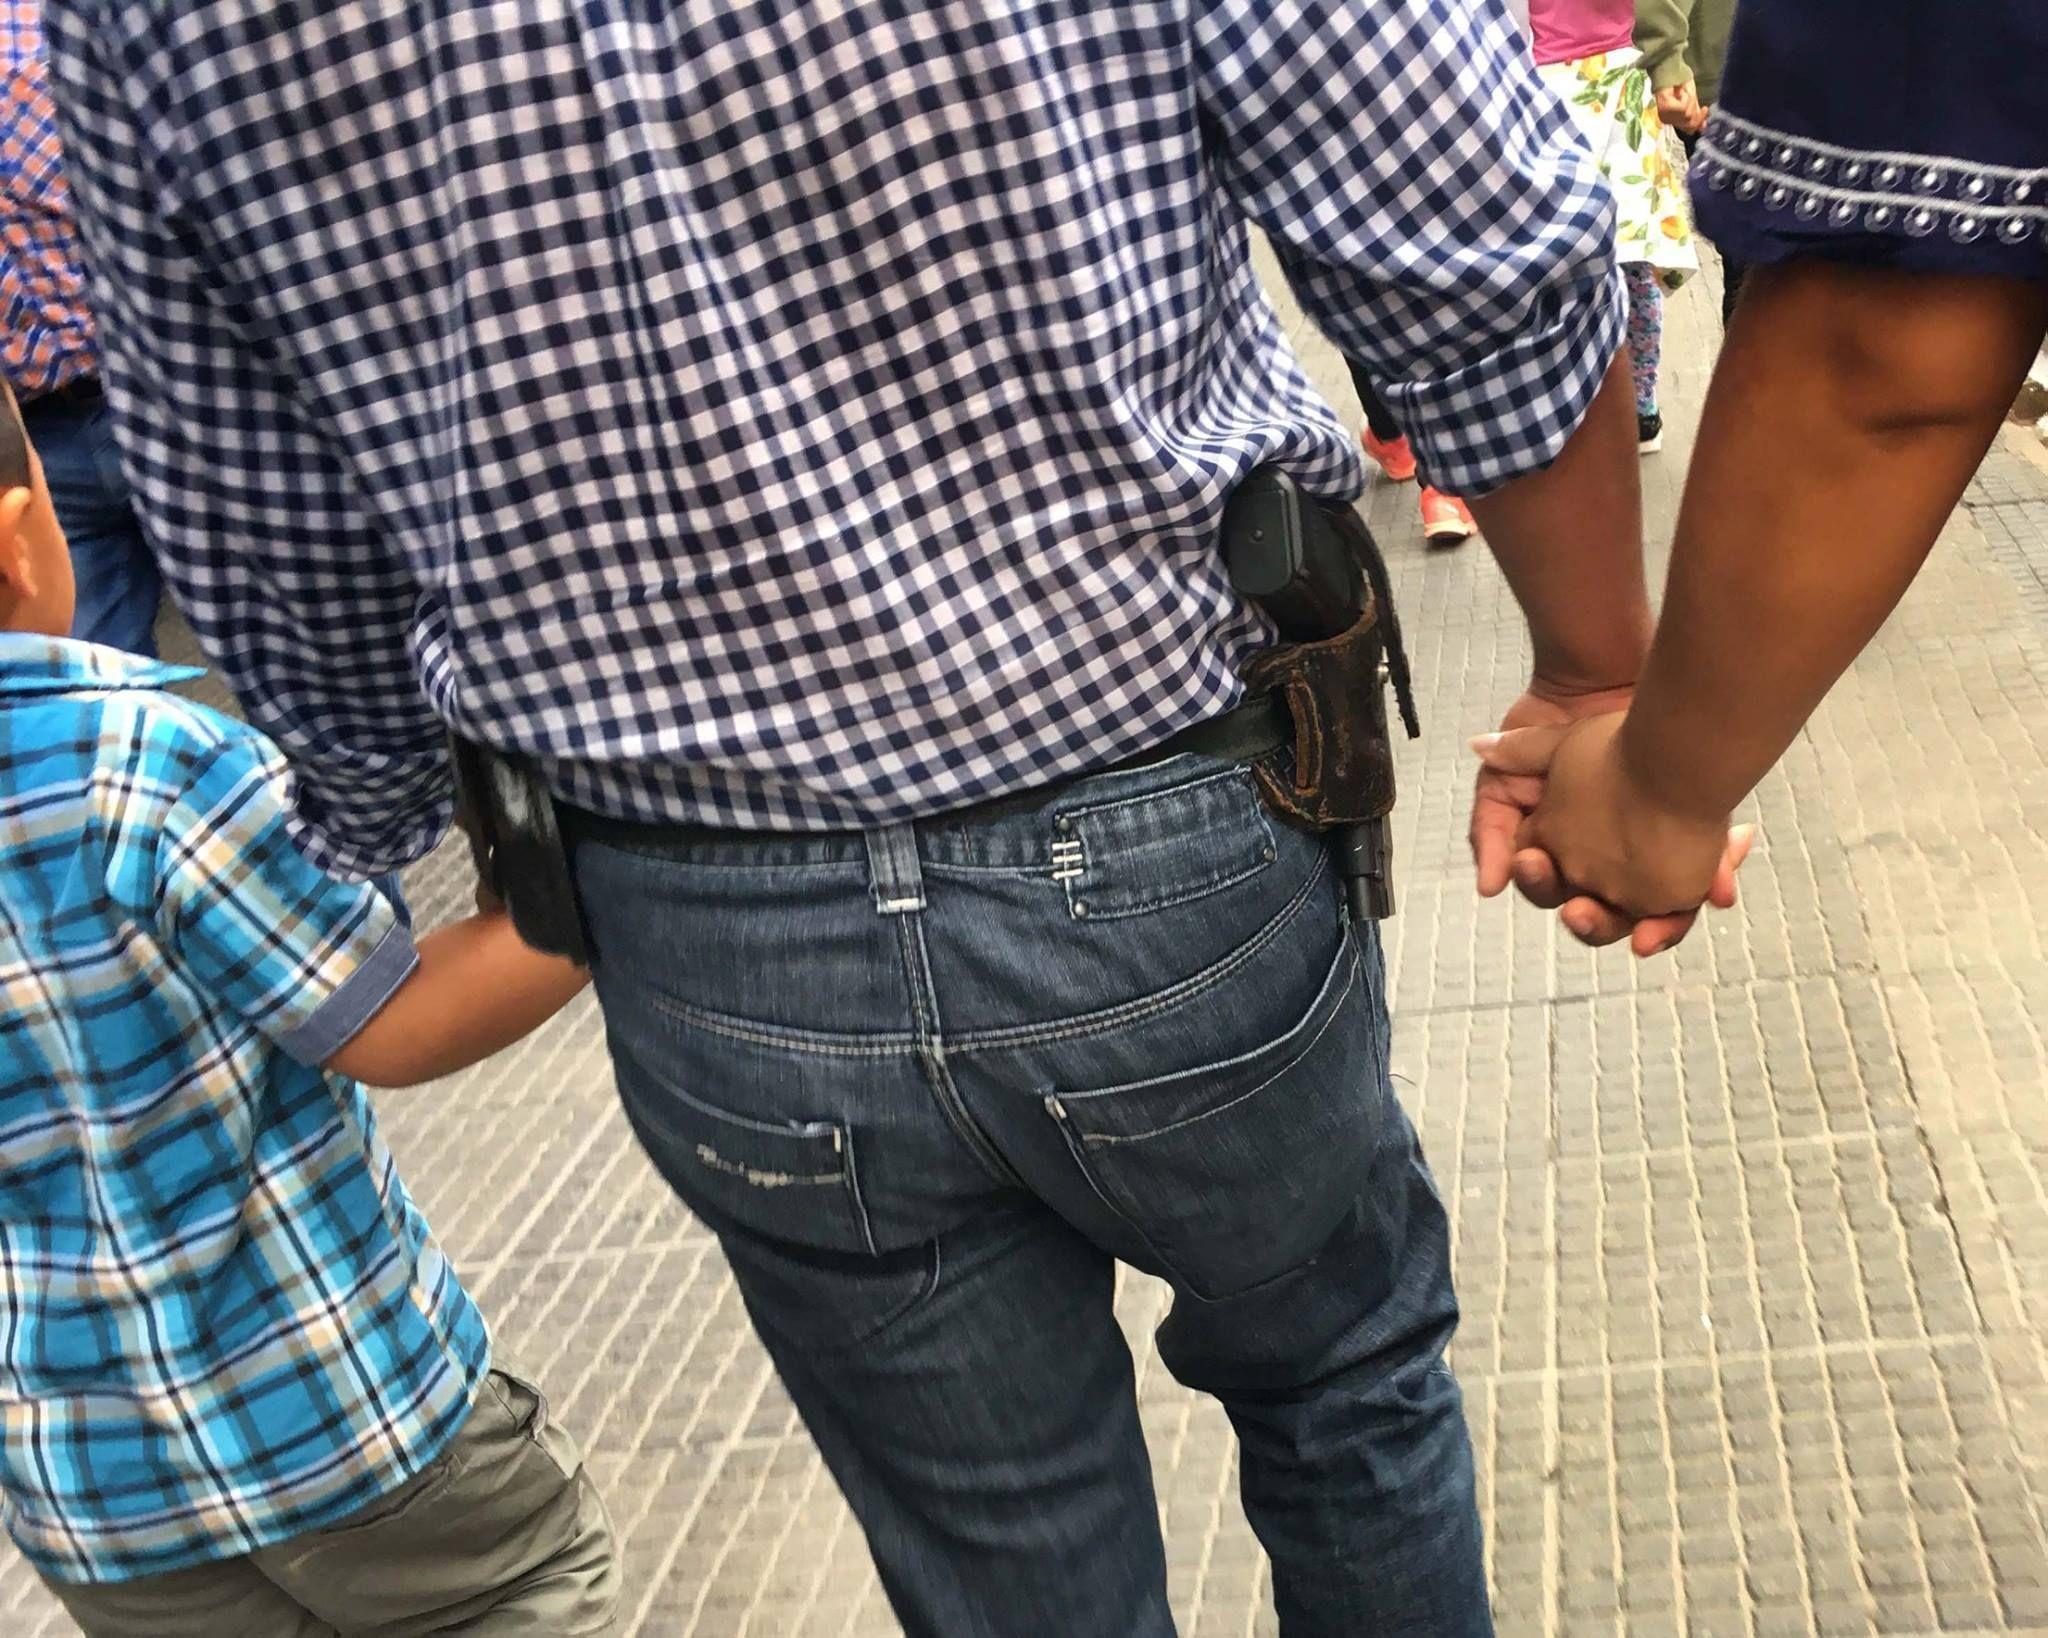 Un hombre camina armado en pleno centro de Tucumán.